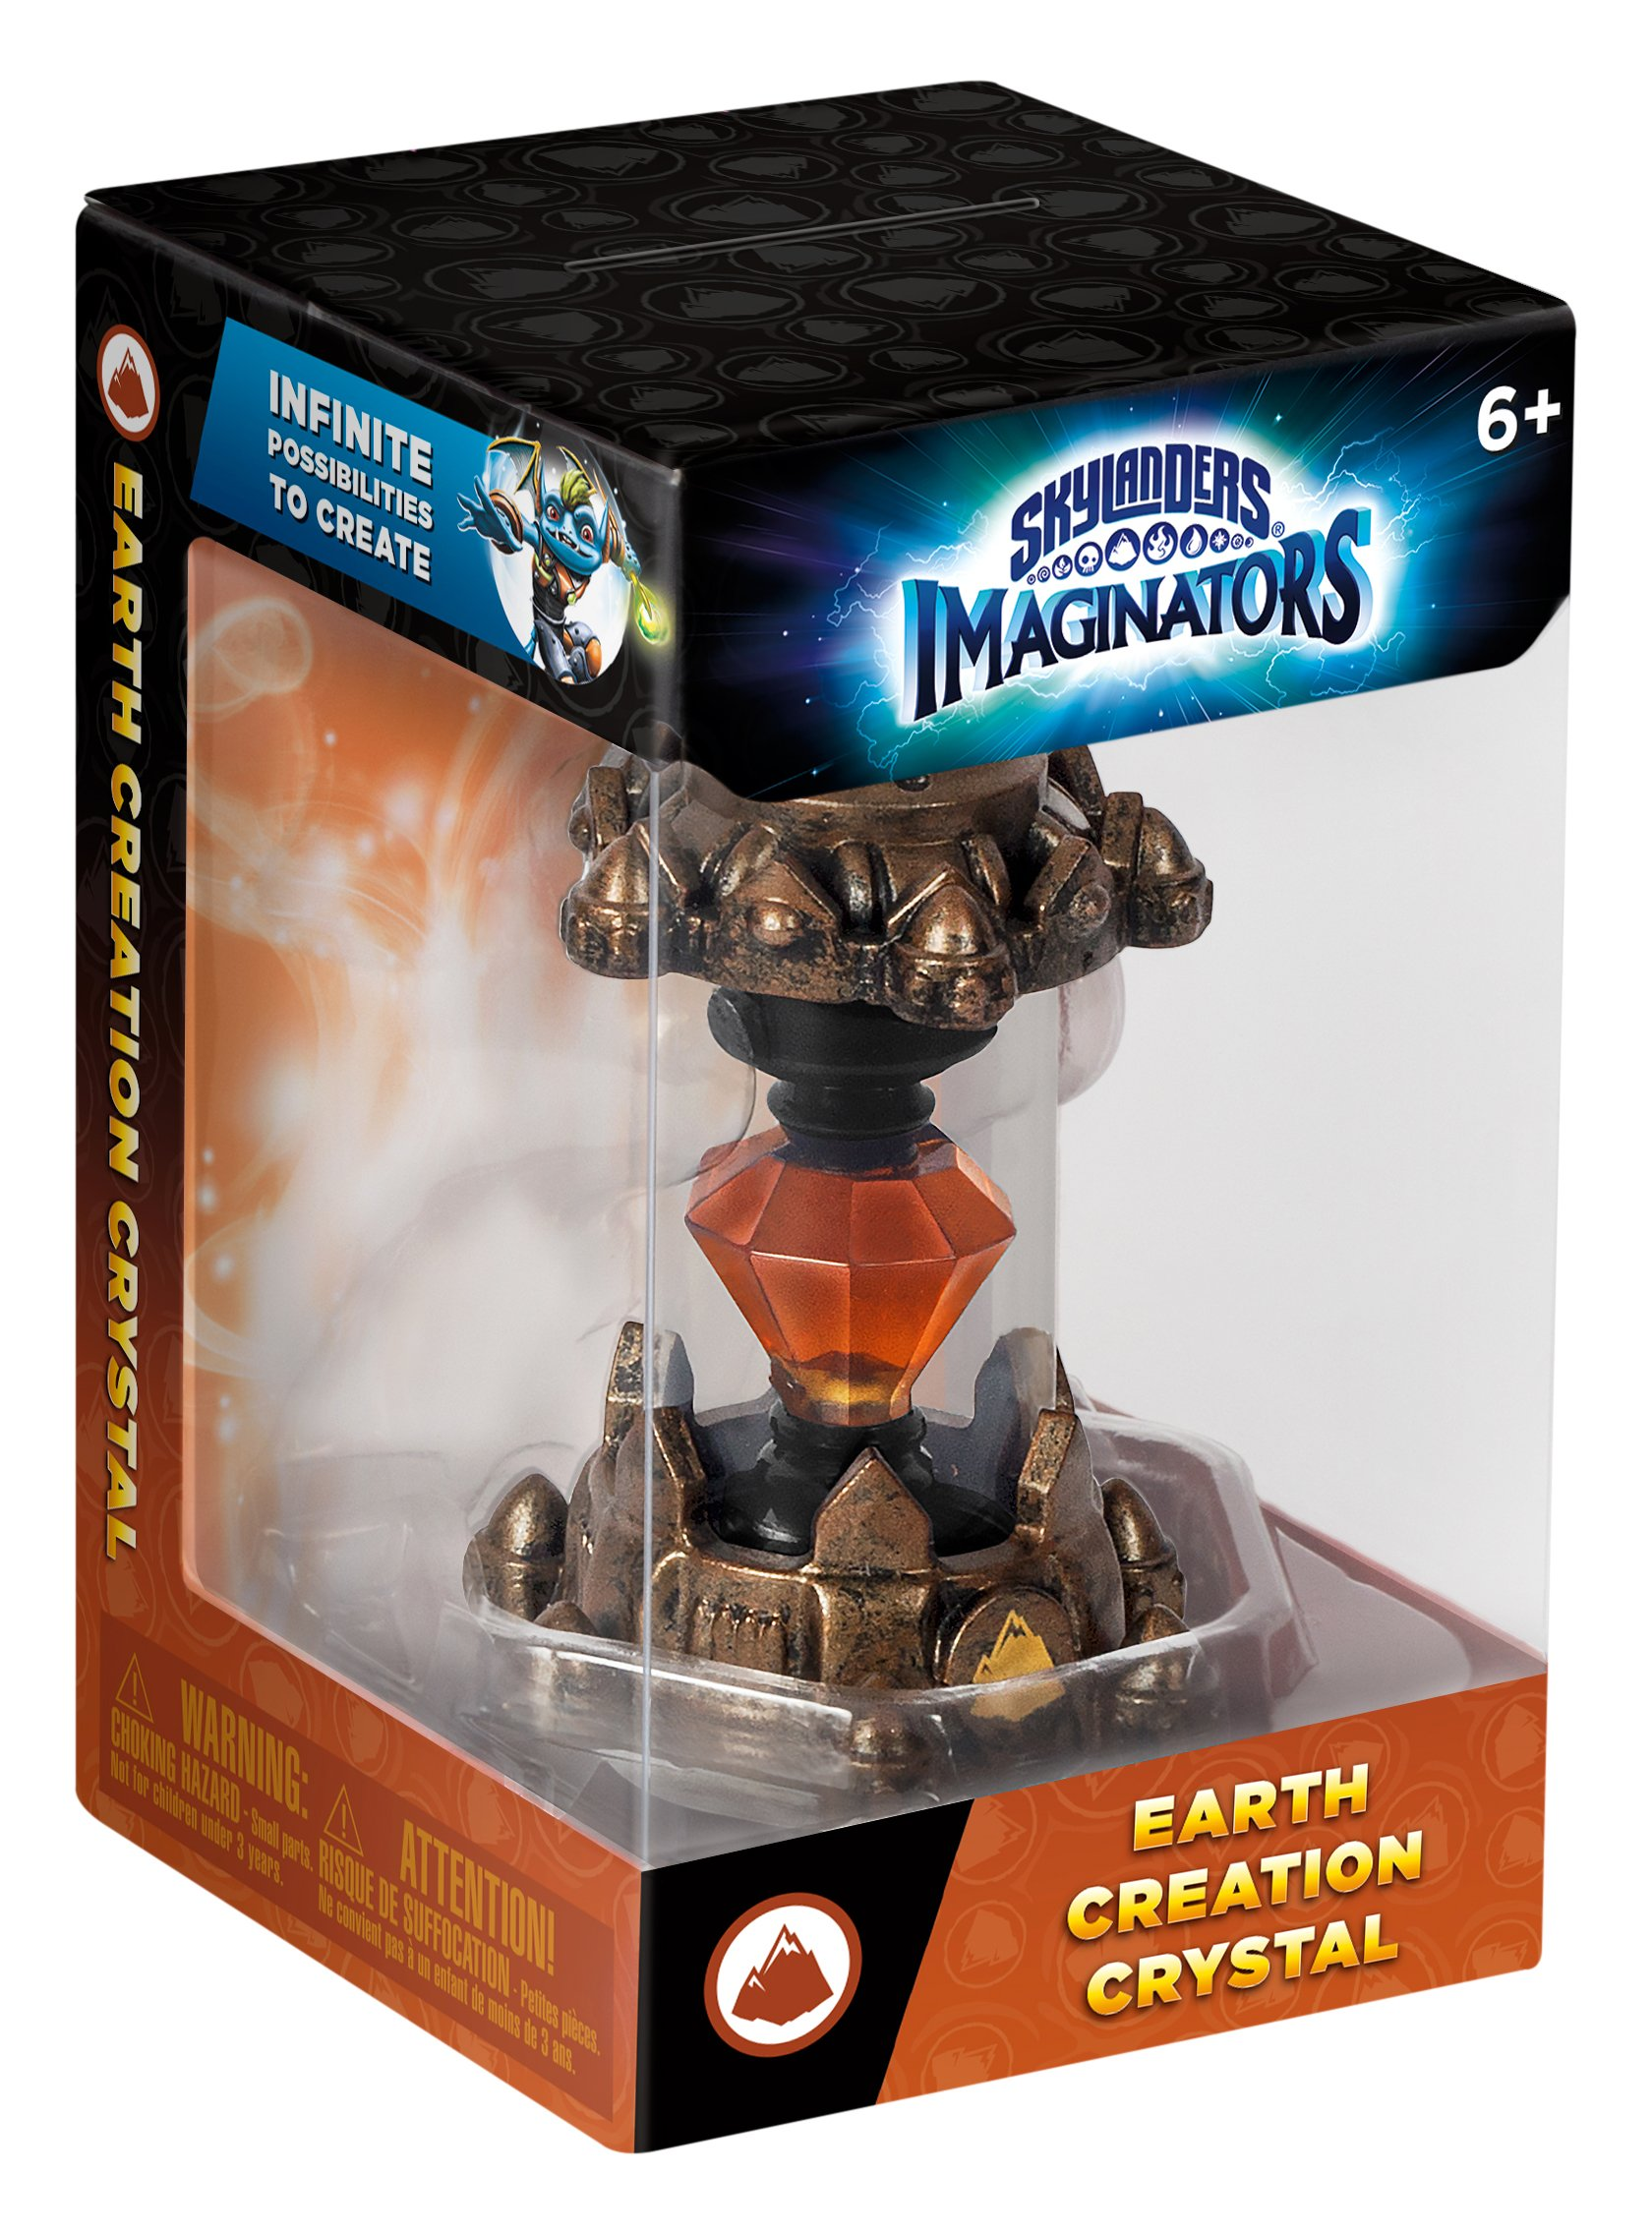 Skylanders Imaginators Earth Creation Crystal